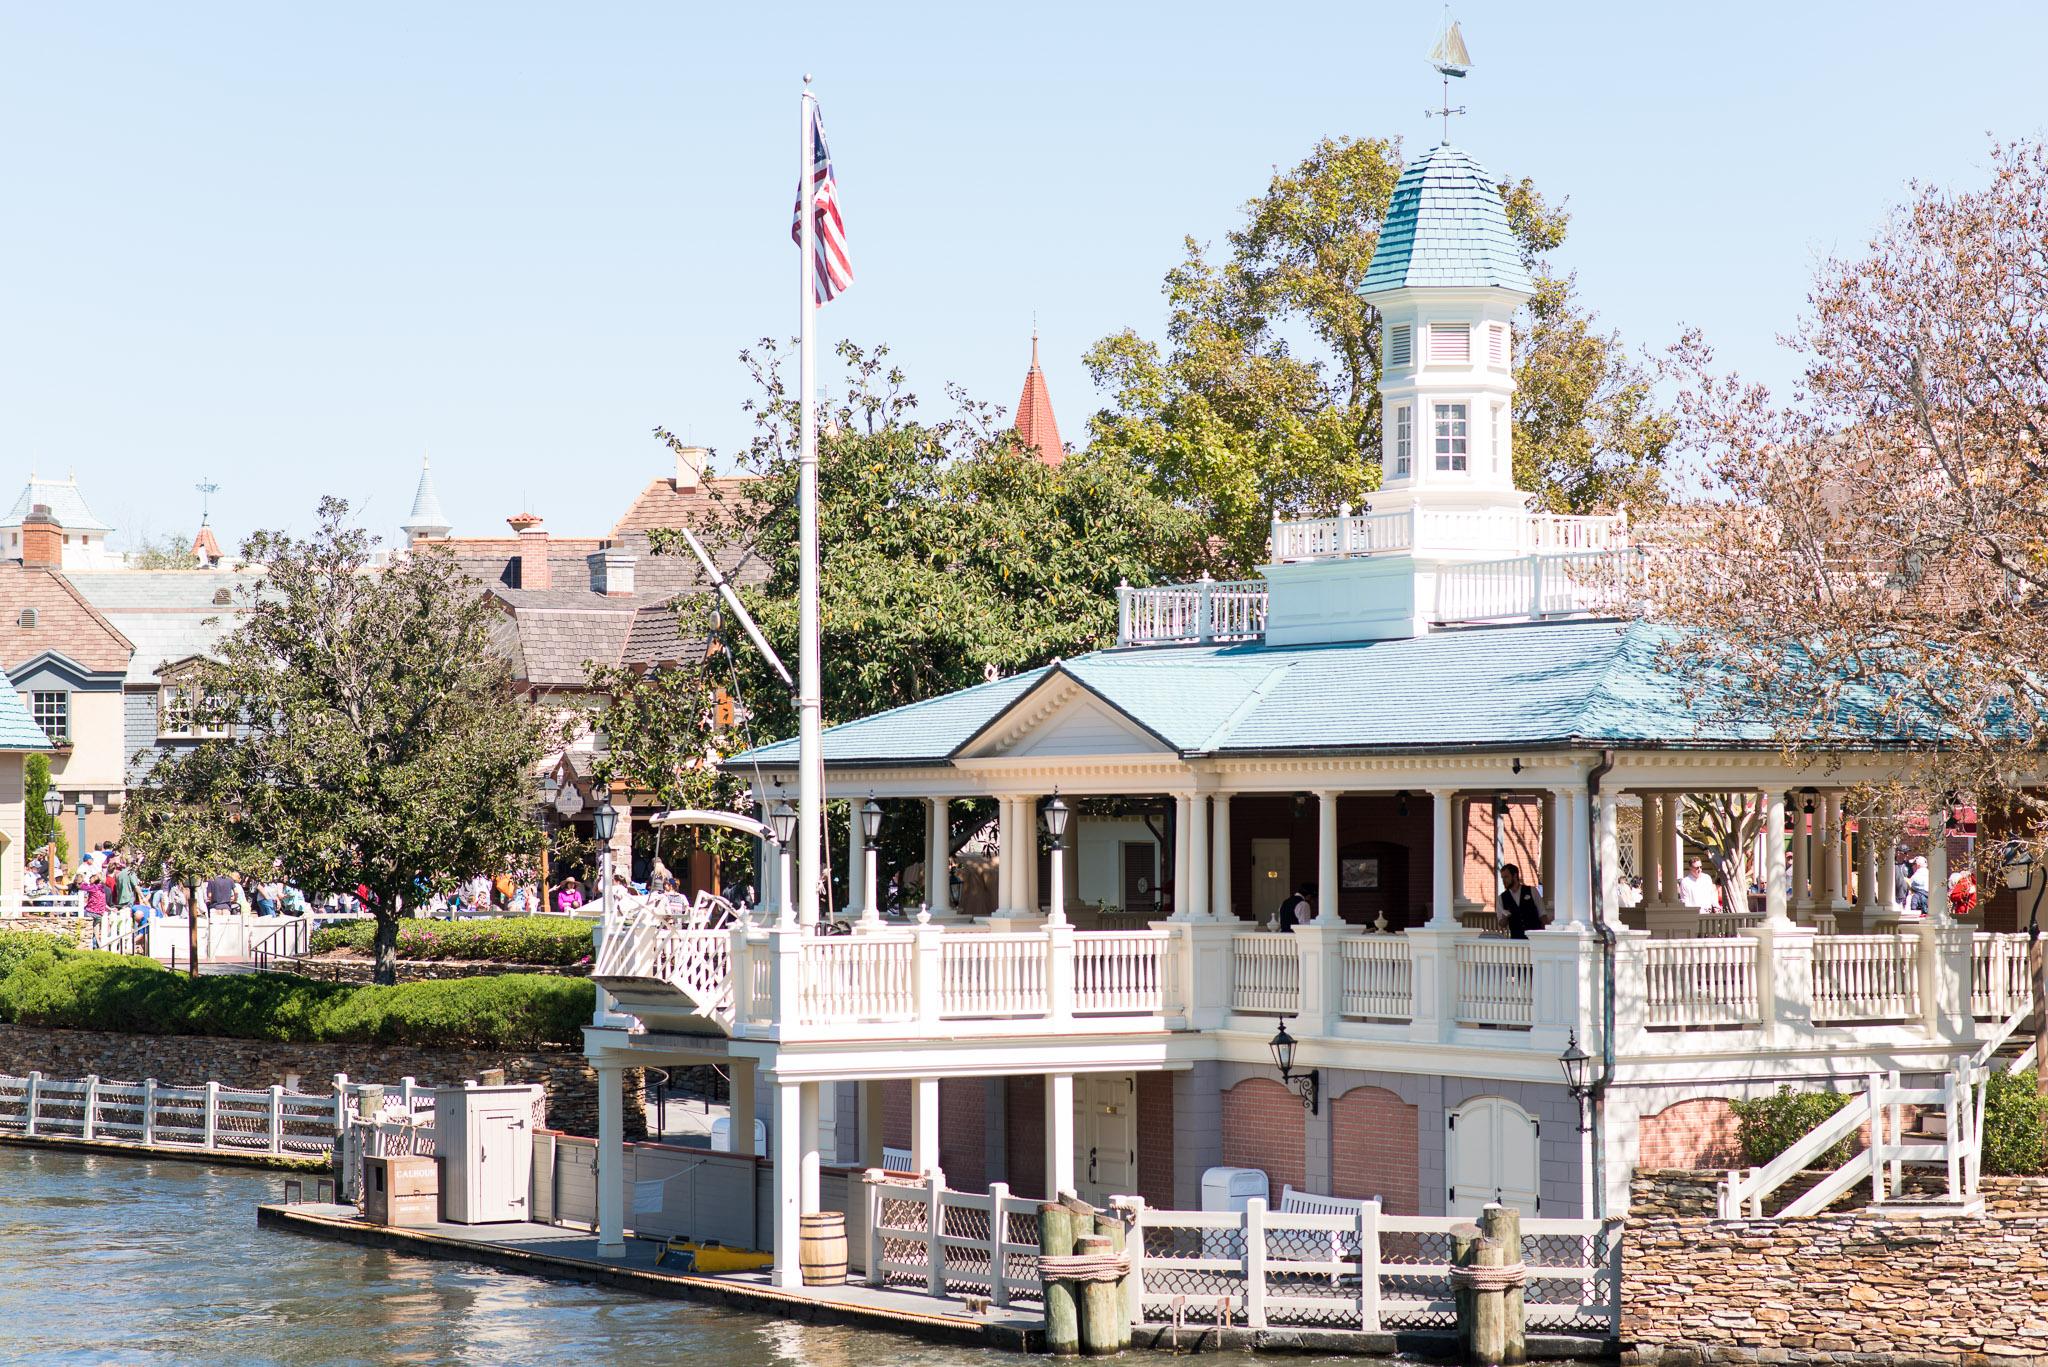 Liberty Belle Dock - Walt Disney World Magic Kingdom